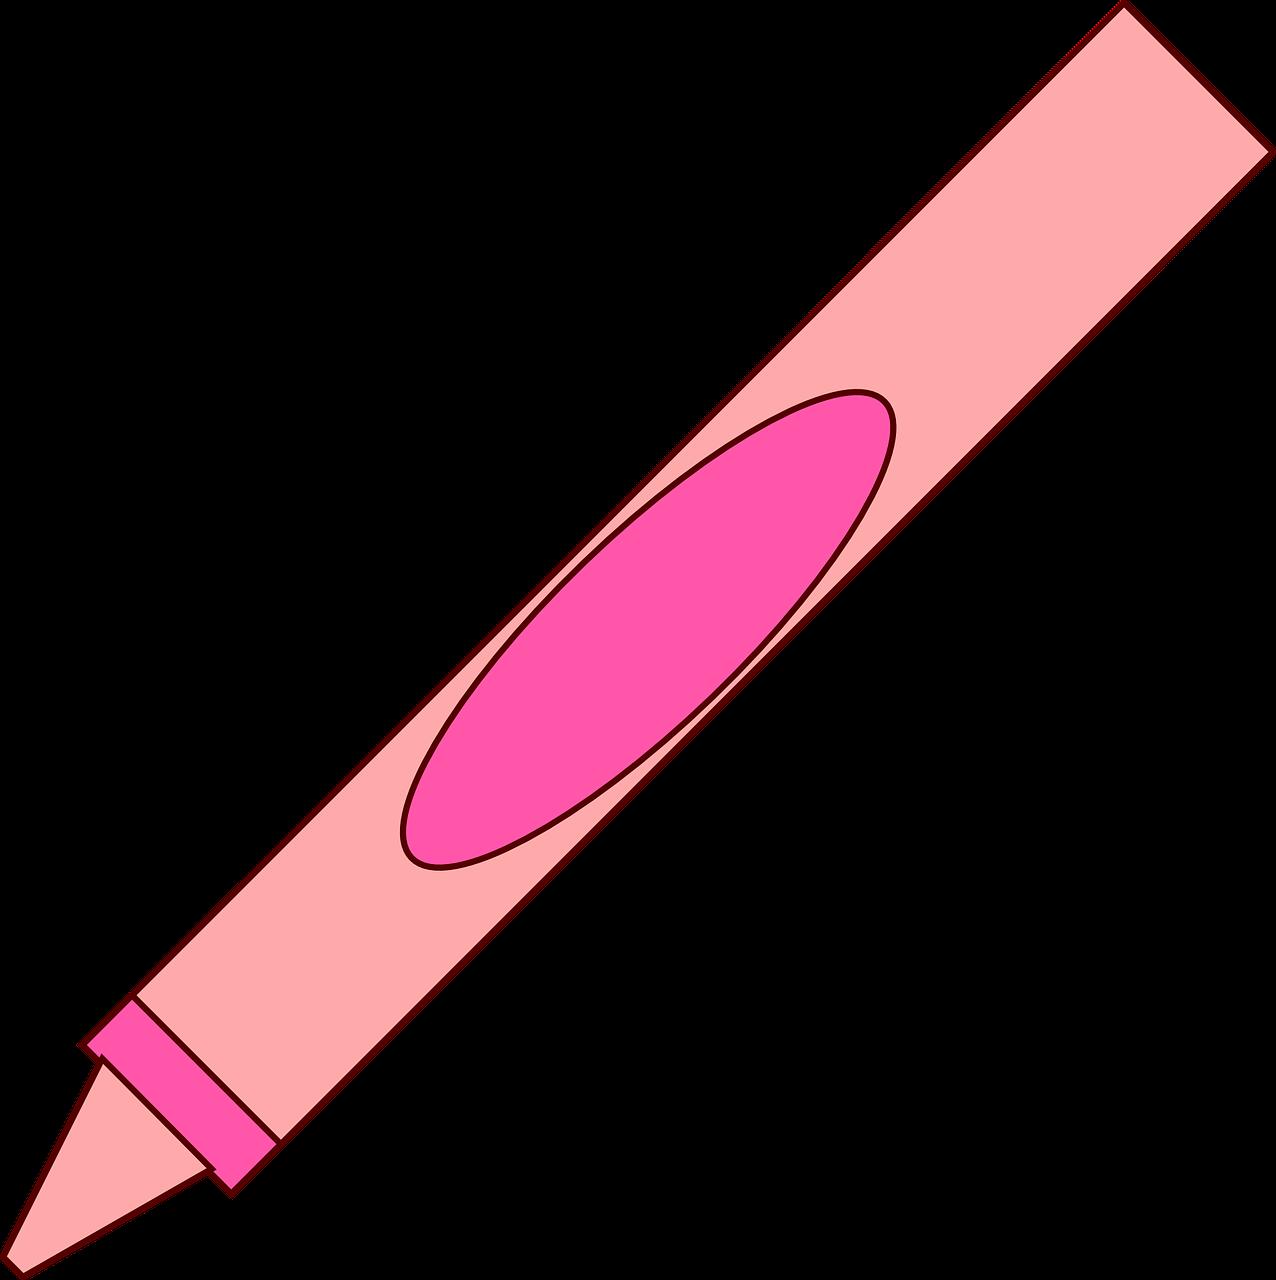 Crayons clipart face. Crayon pink pencil and